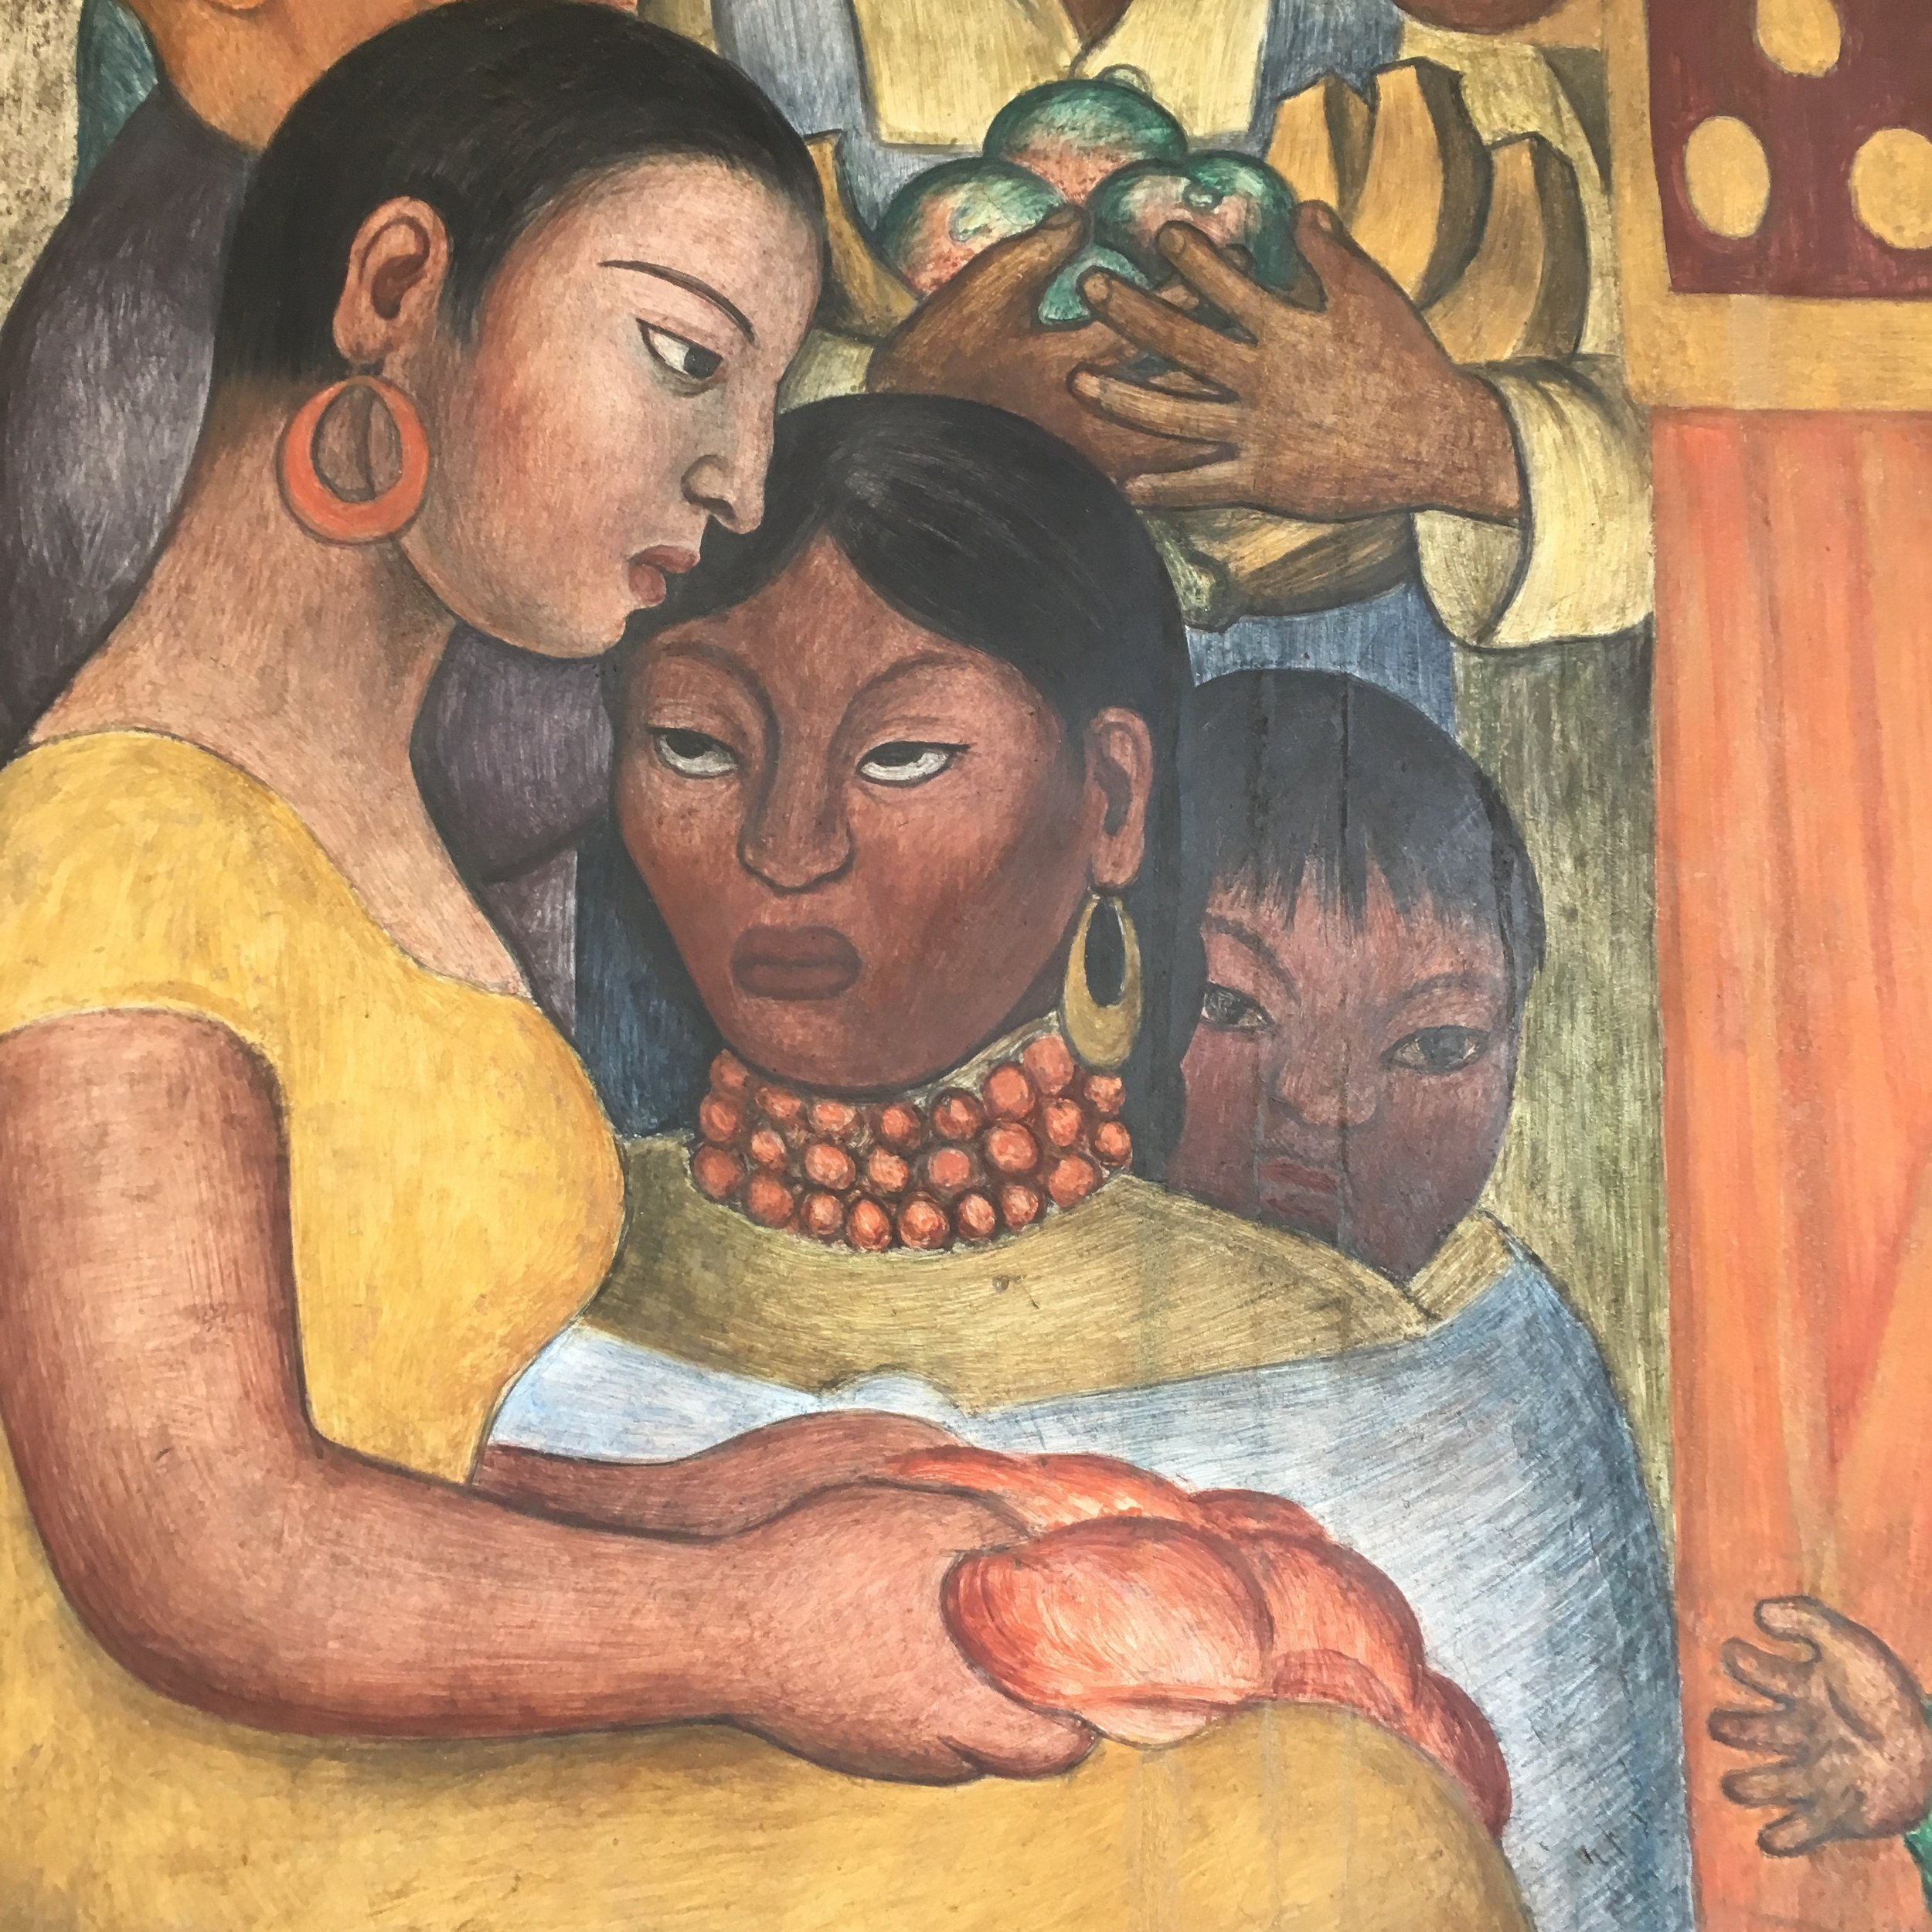 diego rivera mural detail